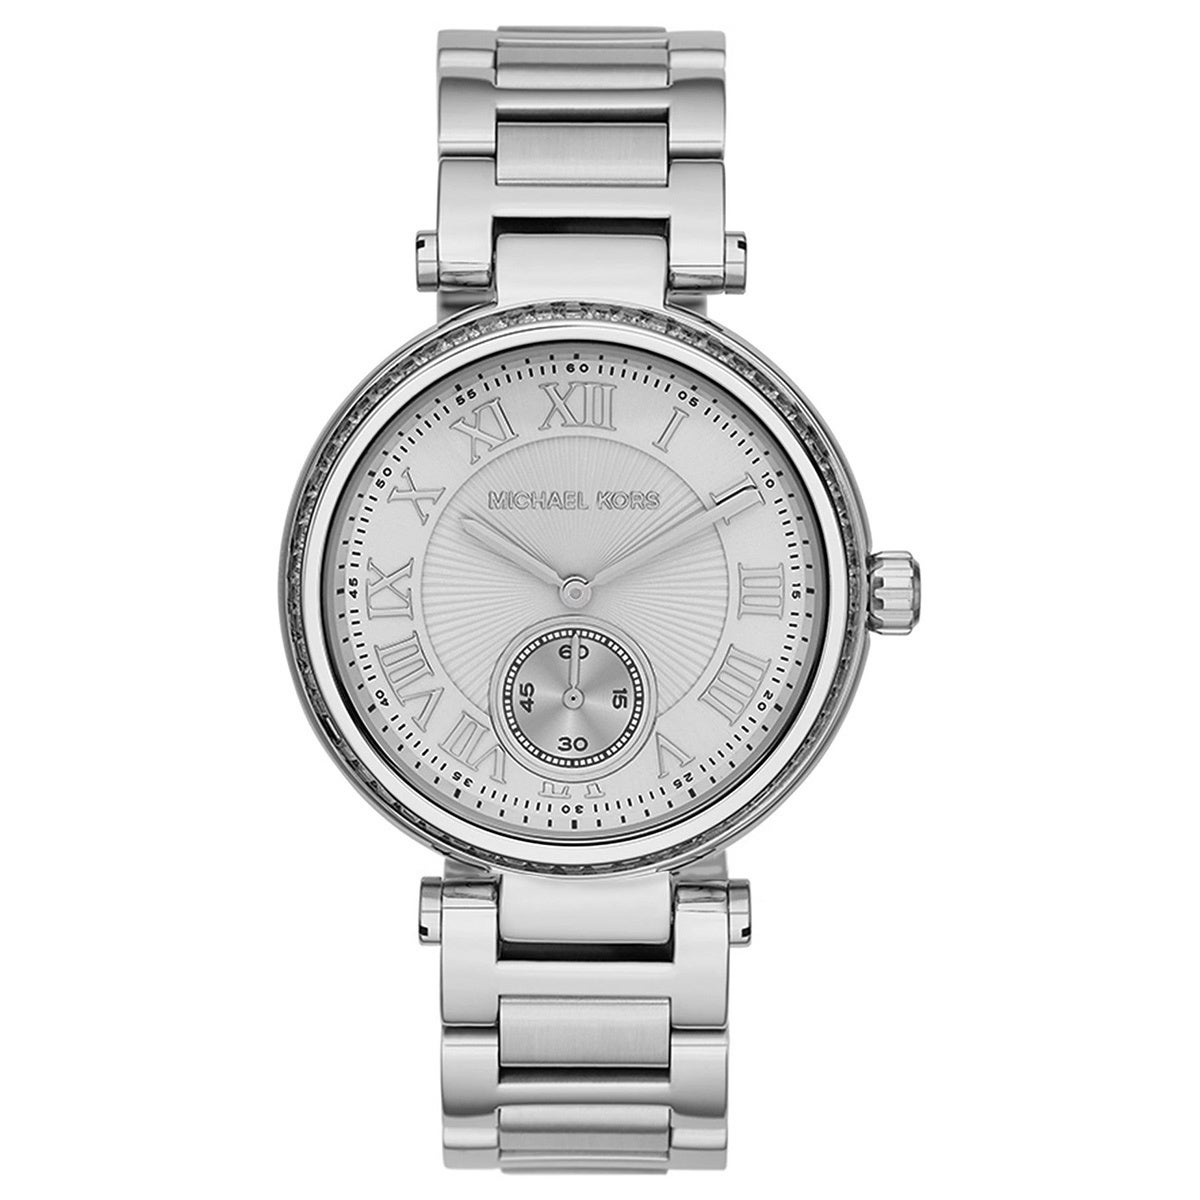 44a4e7783e9d Shop Michael Kors Women s MK5866 Skylar Silvertone Watch - Silver - Free  Shipping Today - Overstock - 9189476